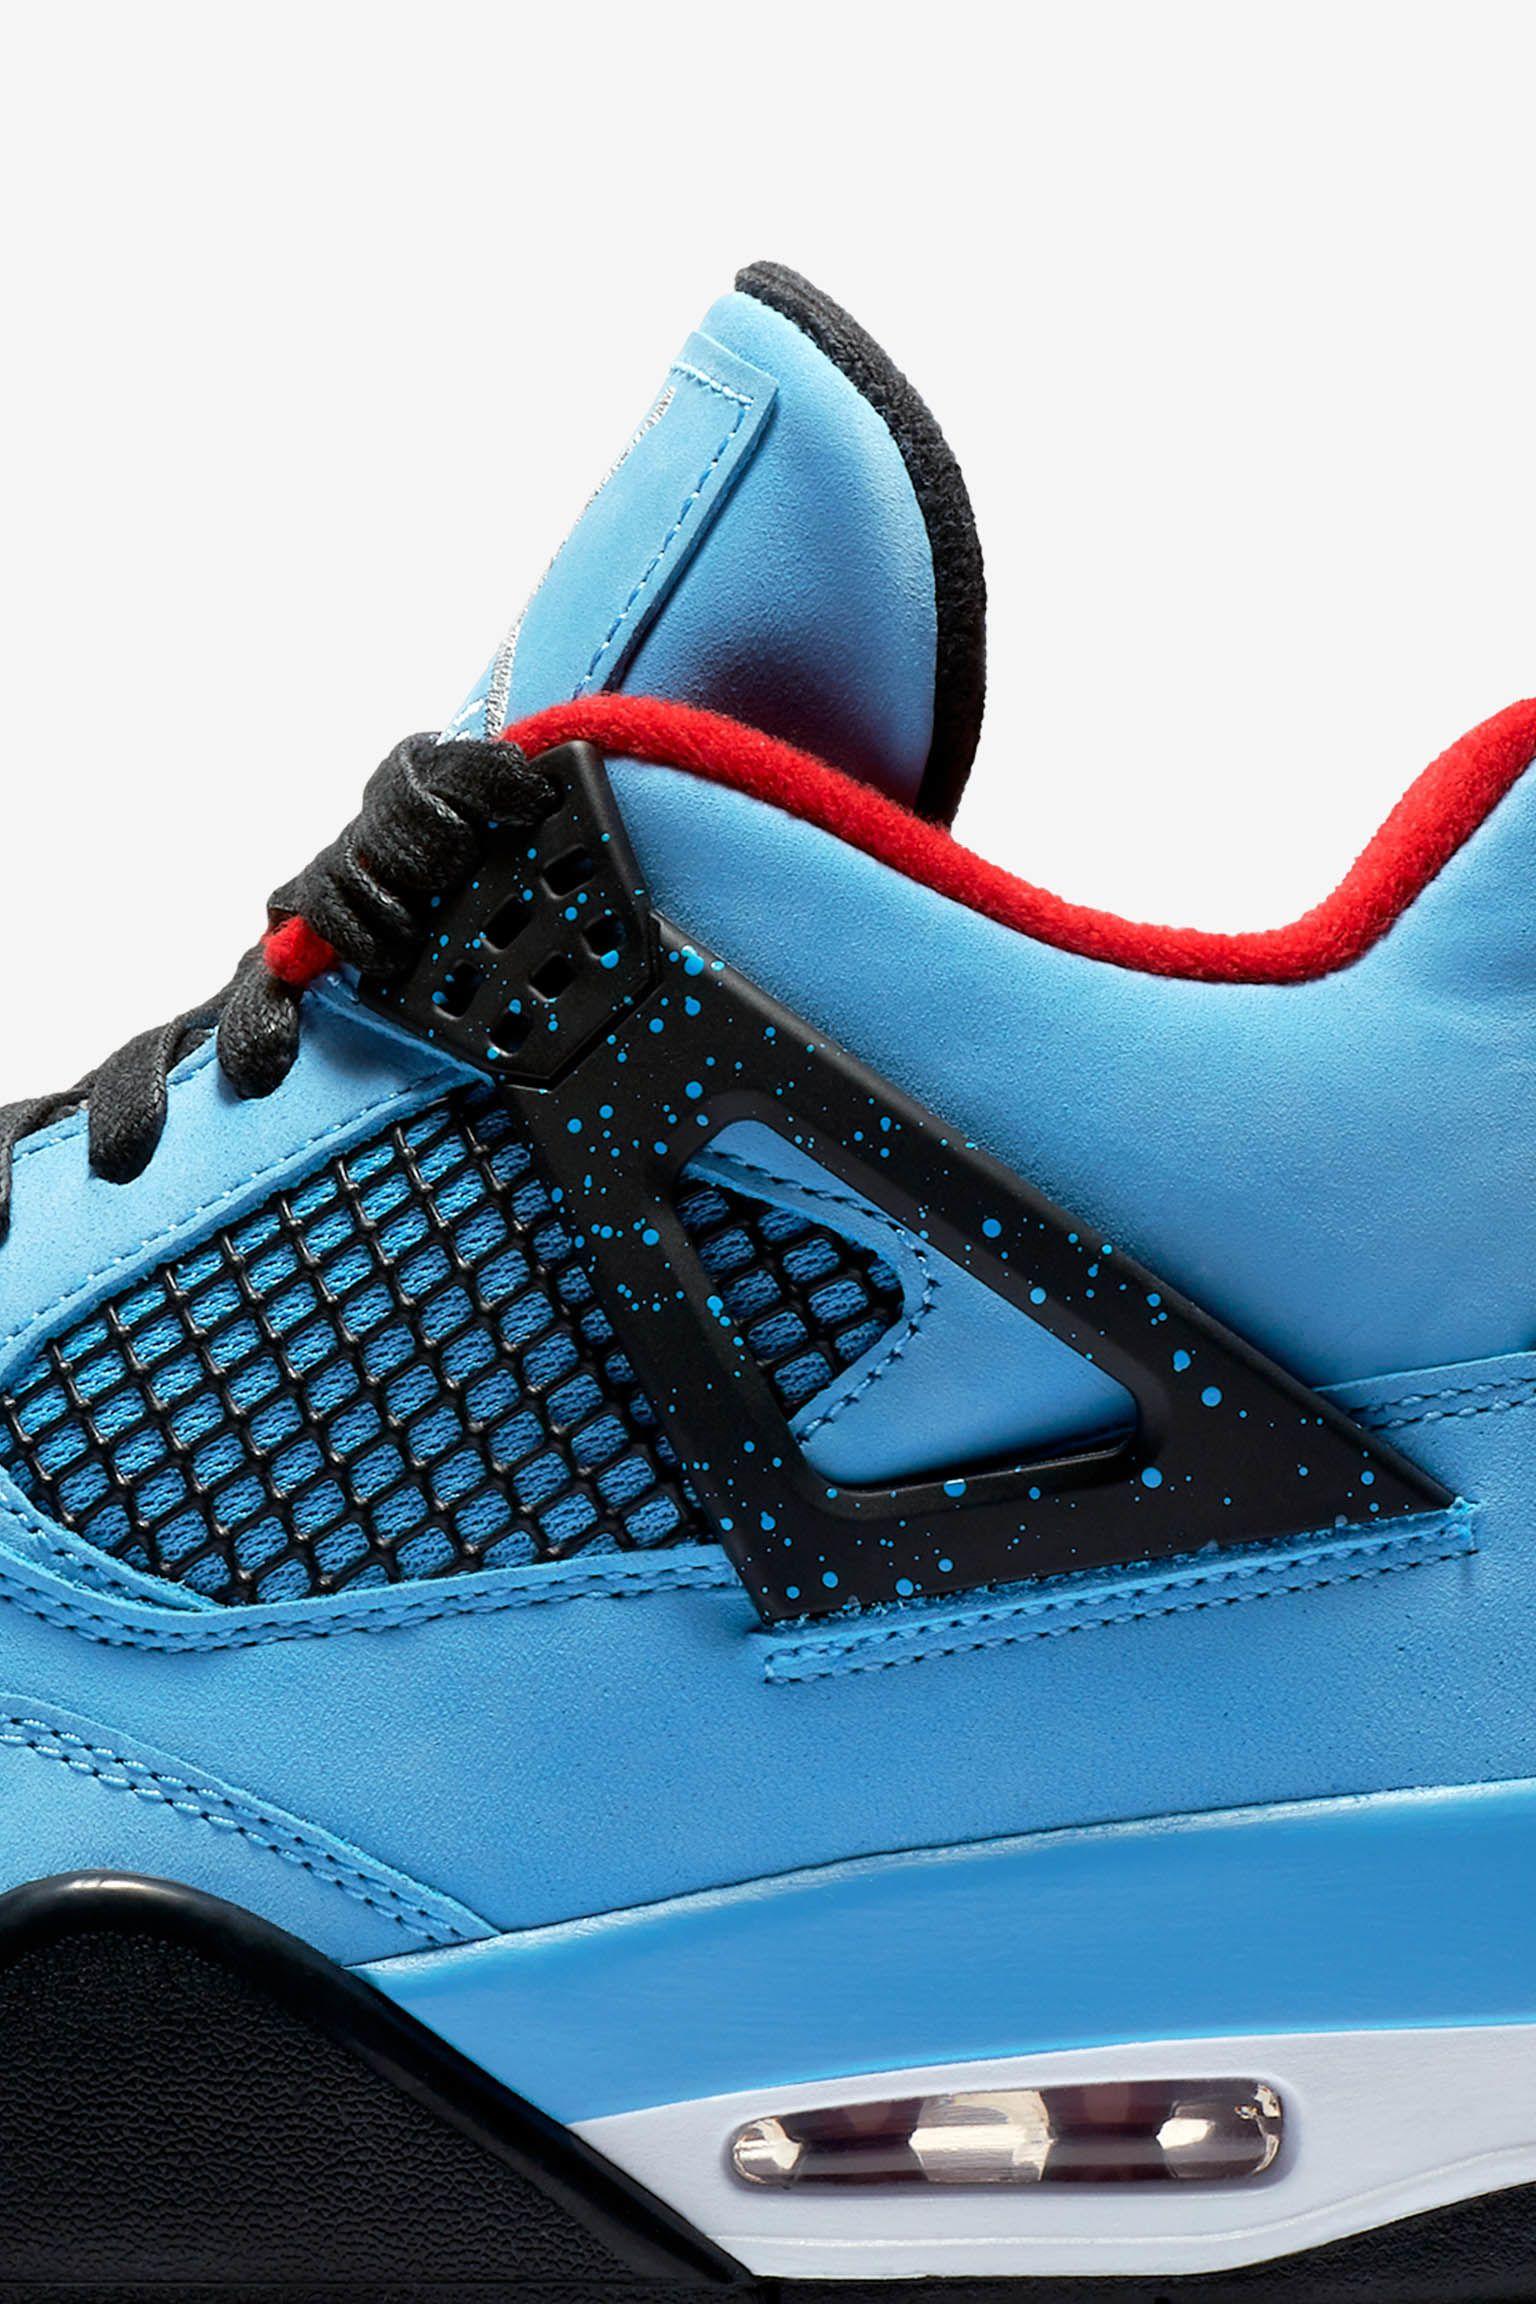 Air Jordan 4 Travis Scott 'Cactus Jack' Release Date